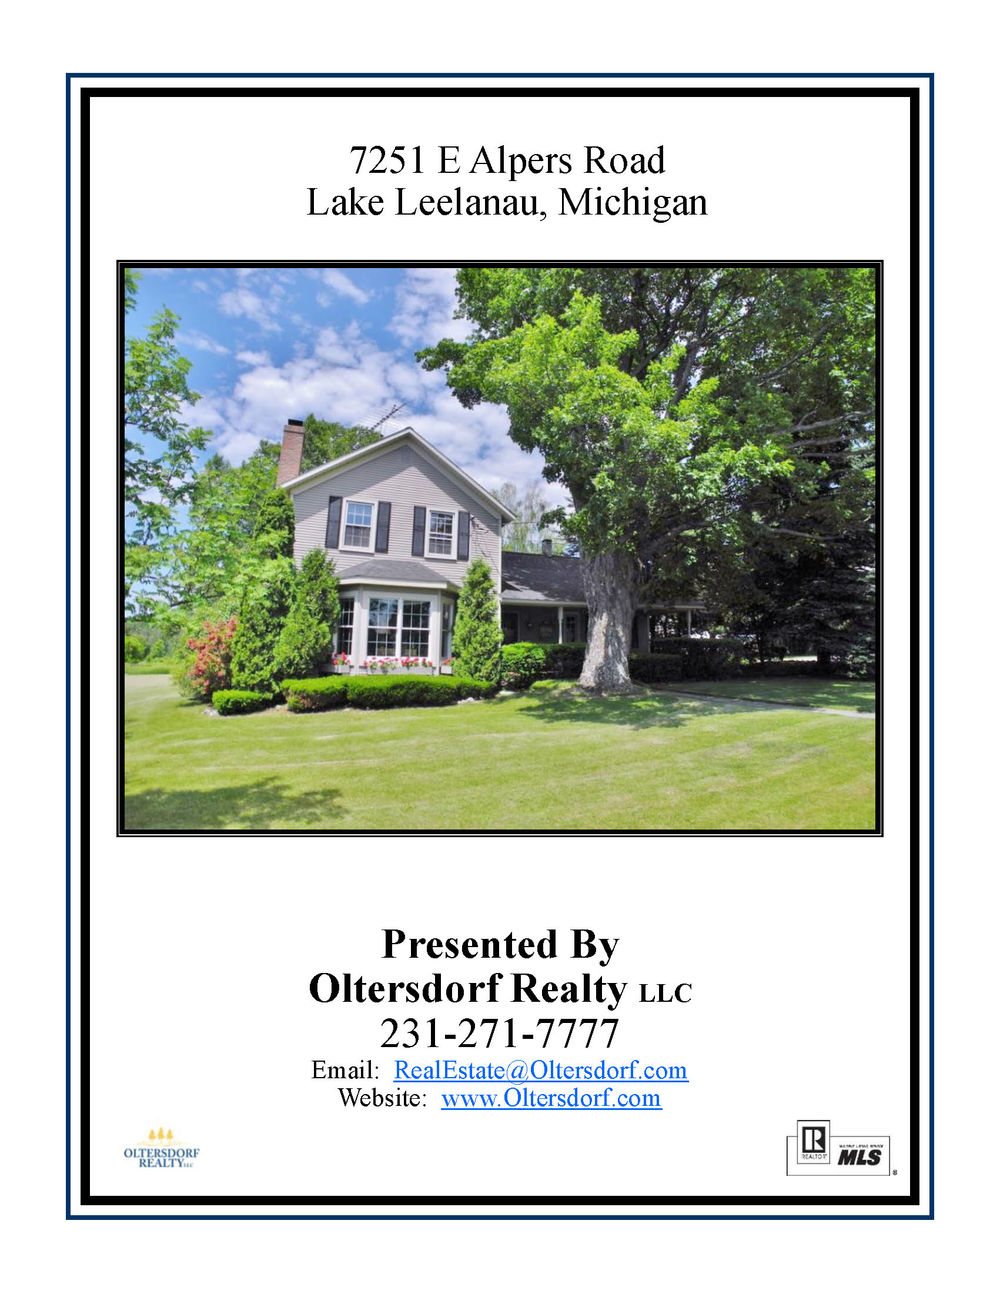 7251 E Alpers Road, Lake Leelanau, MI – Historic 1865 Centennial Inn For Sale By Oltersdorf Realty LLC Information Packet (1).jpg